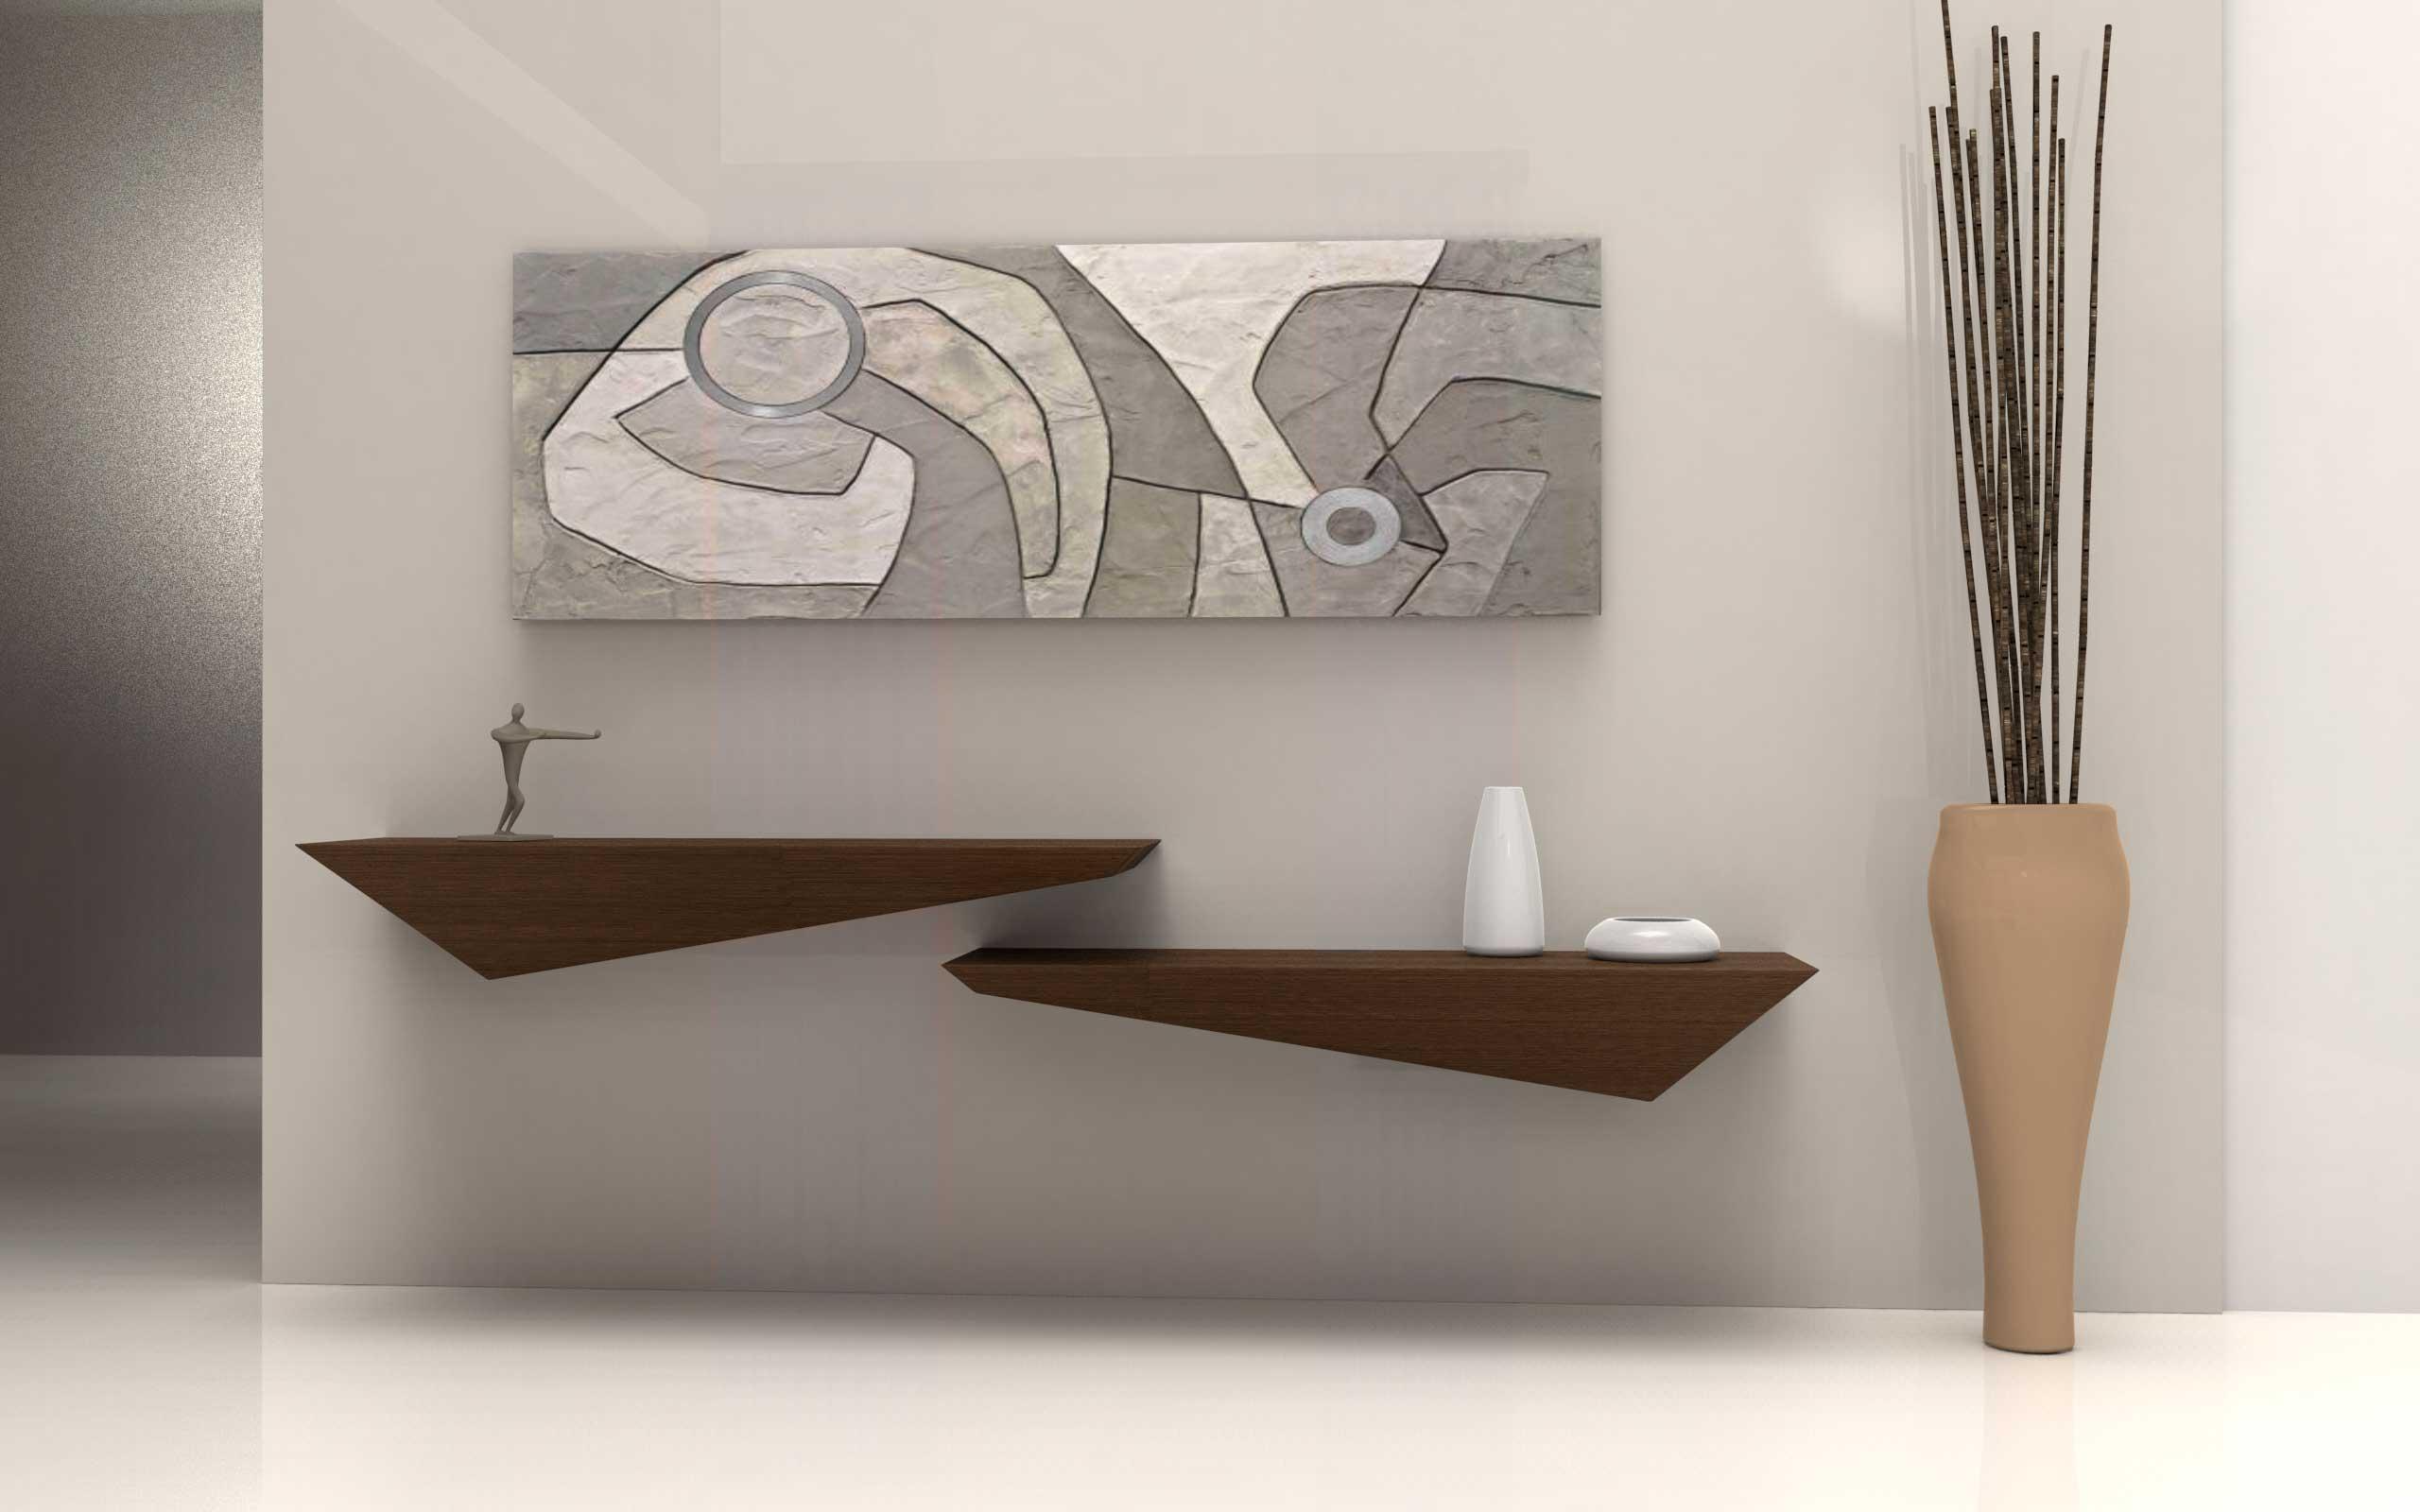 Awesome Mensole Porta Tv Images - Amazing House Design ...